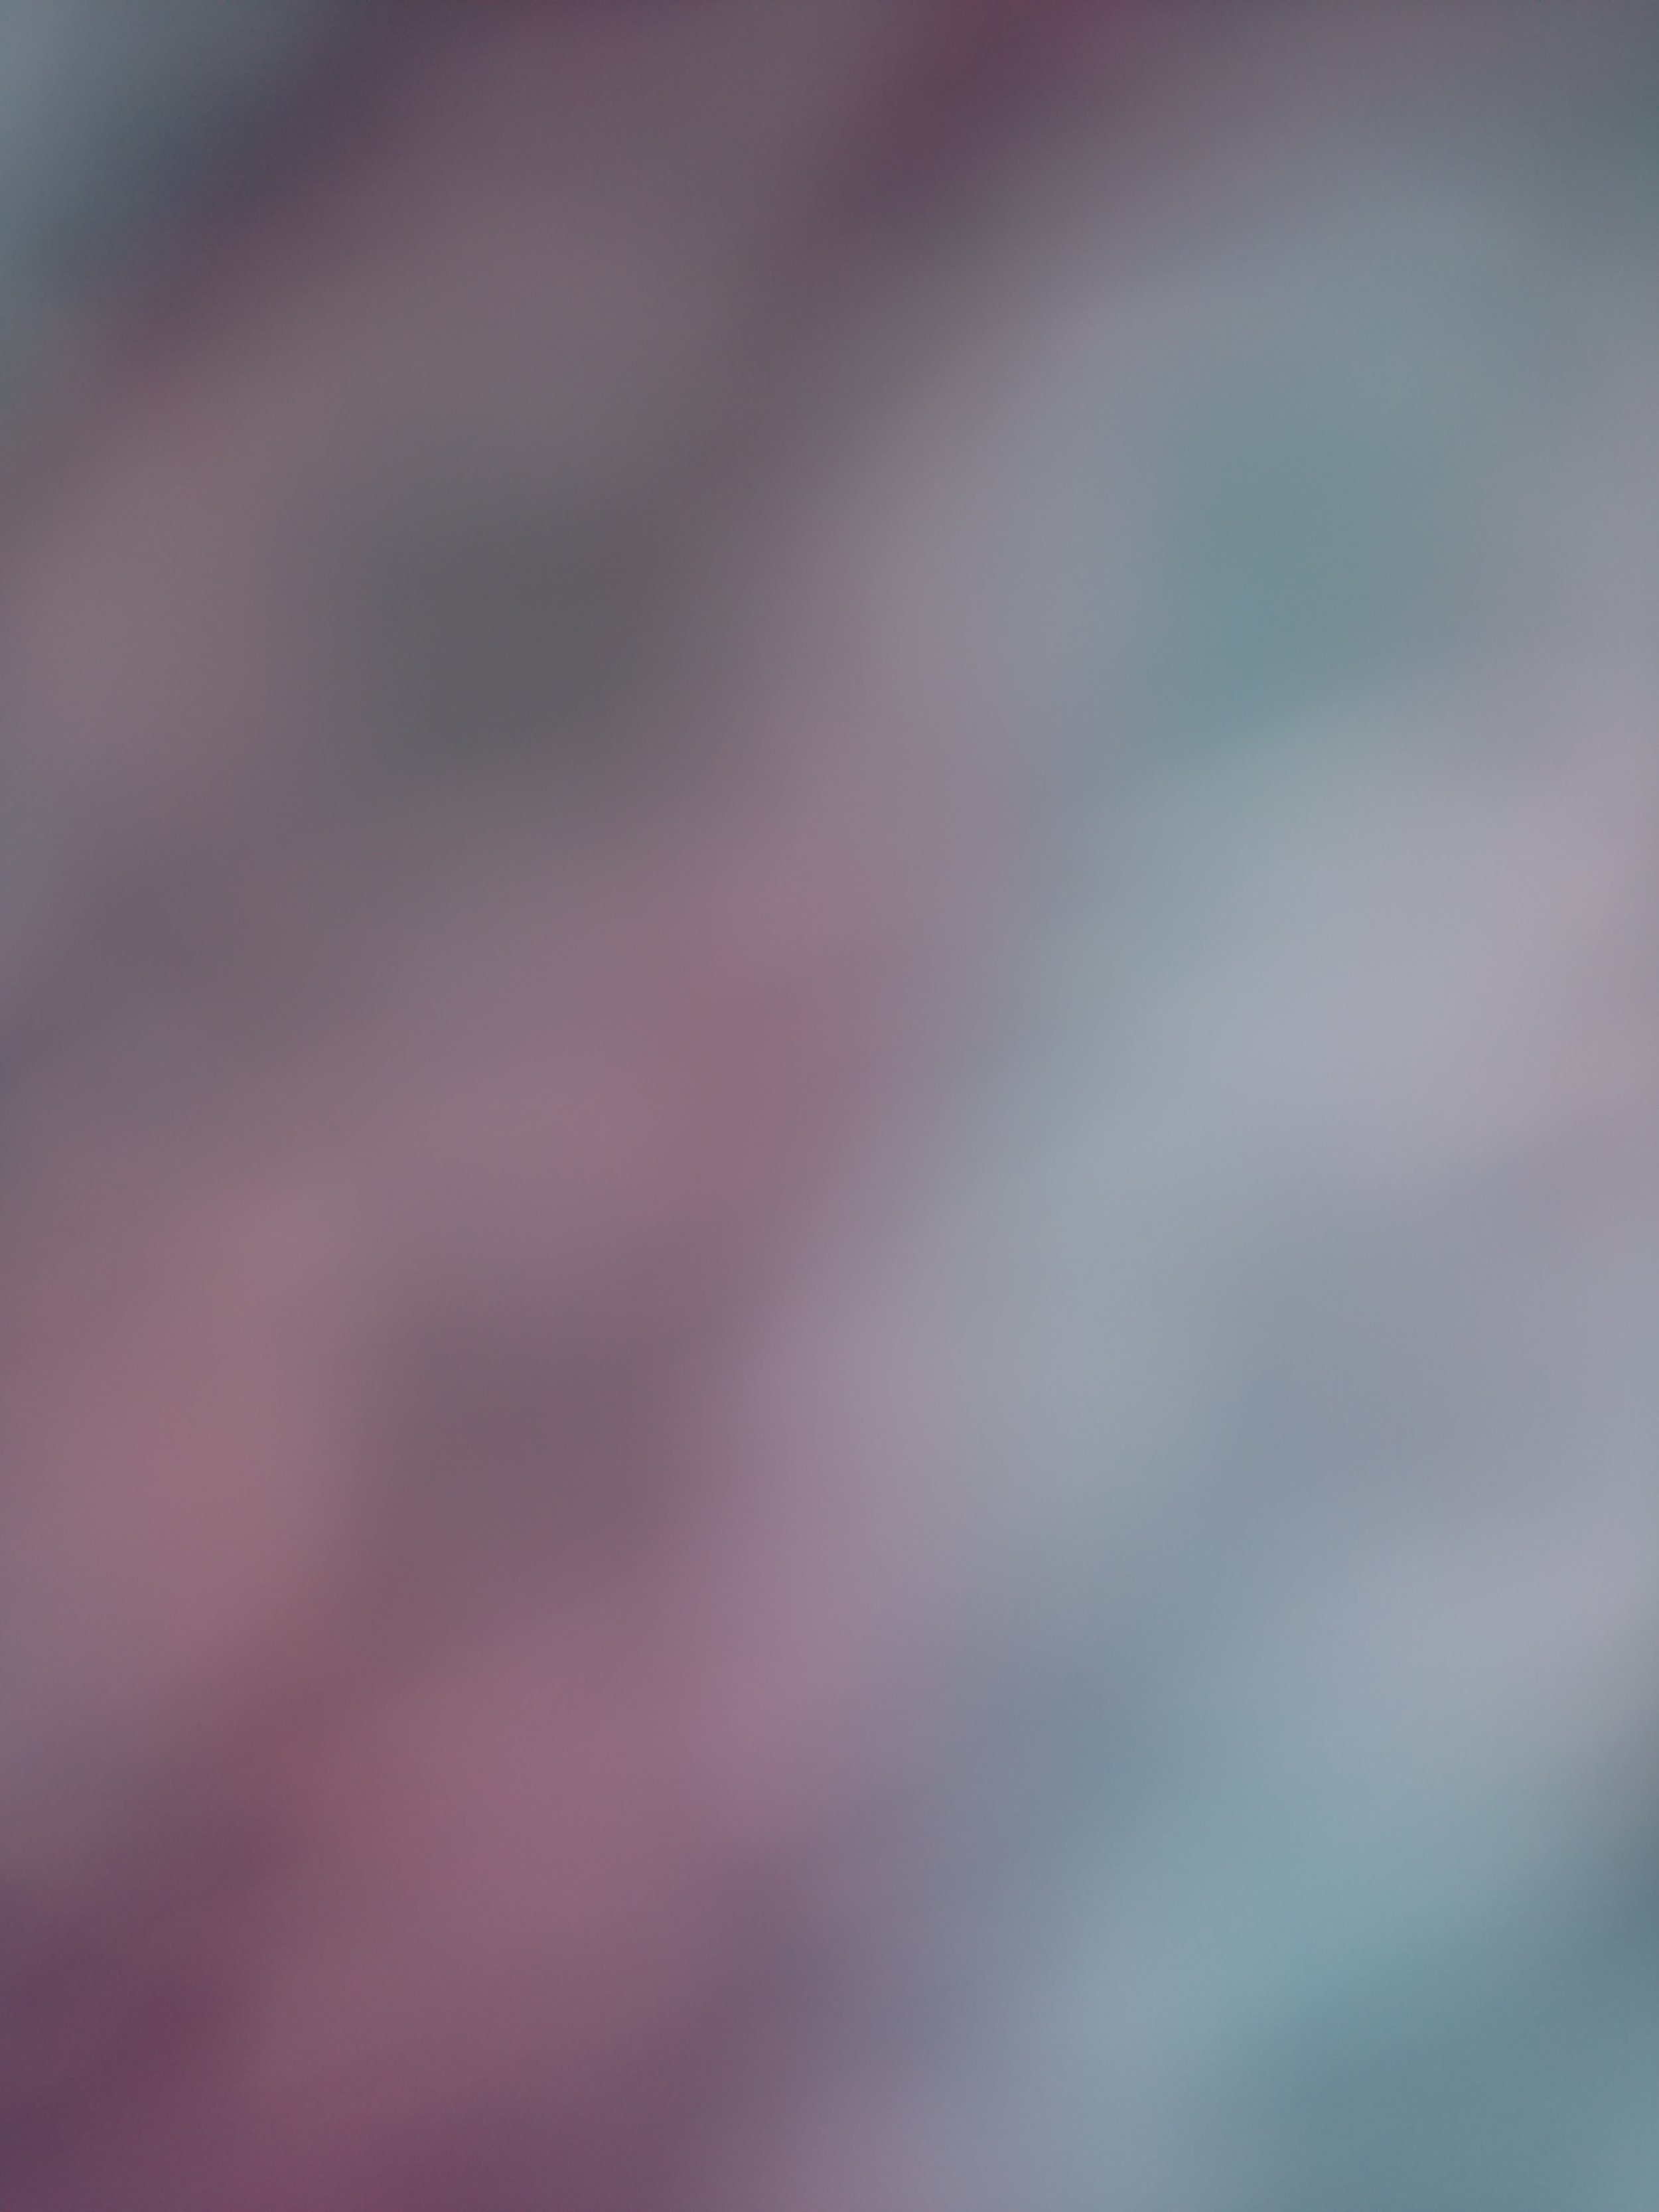 willroth-co-free-texture-gradient-007.jpg